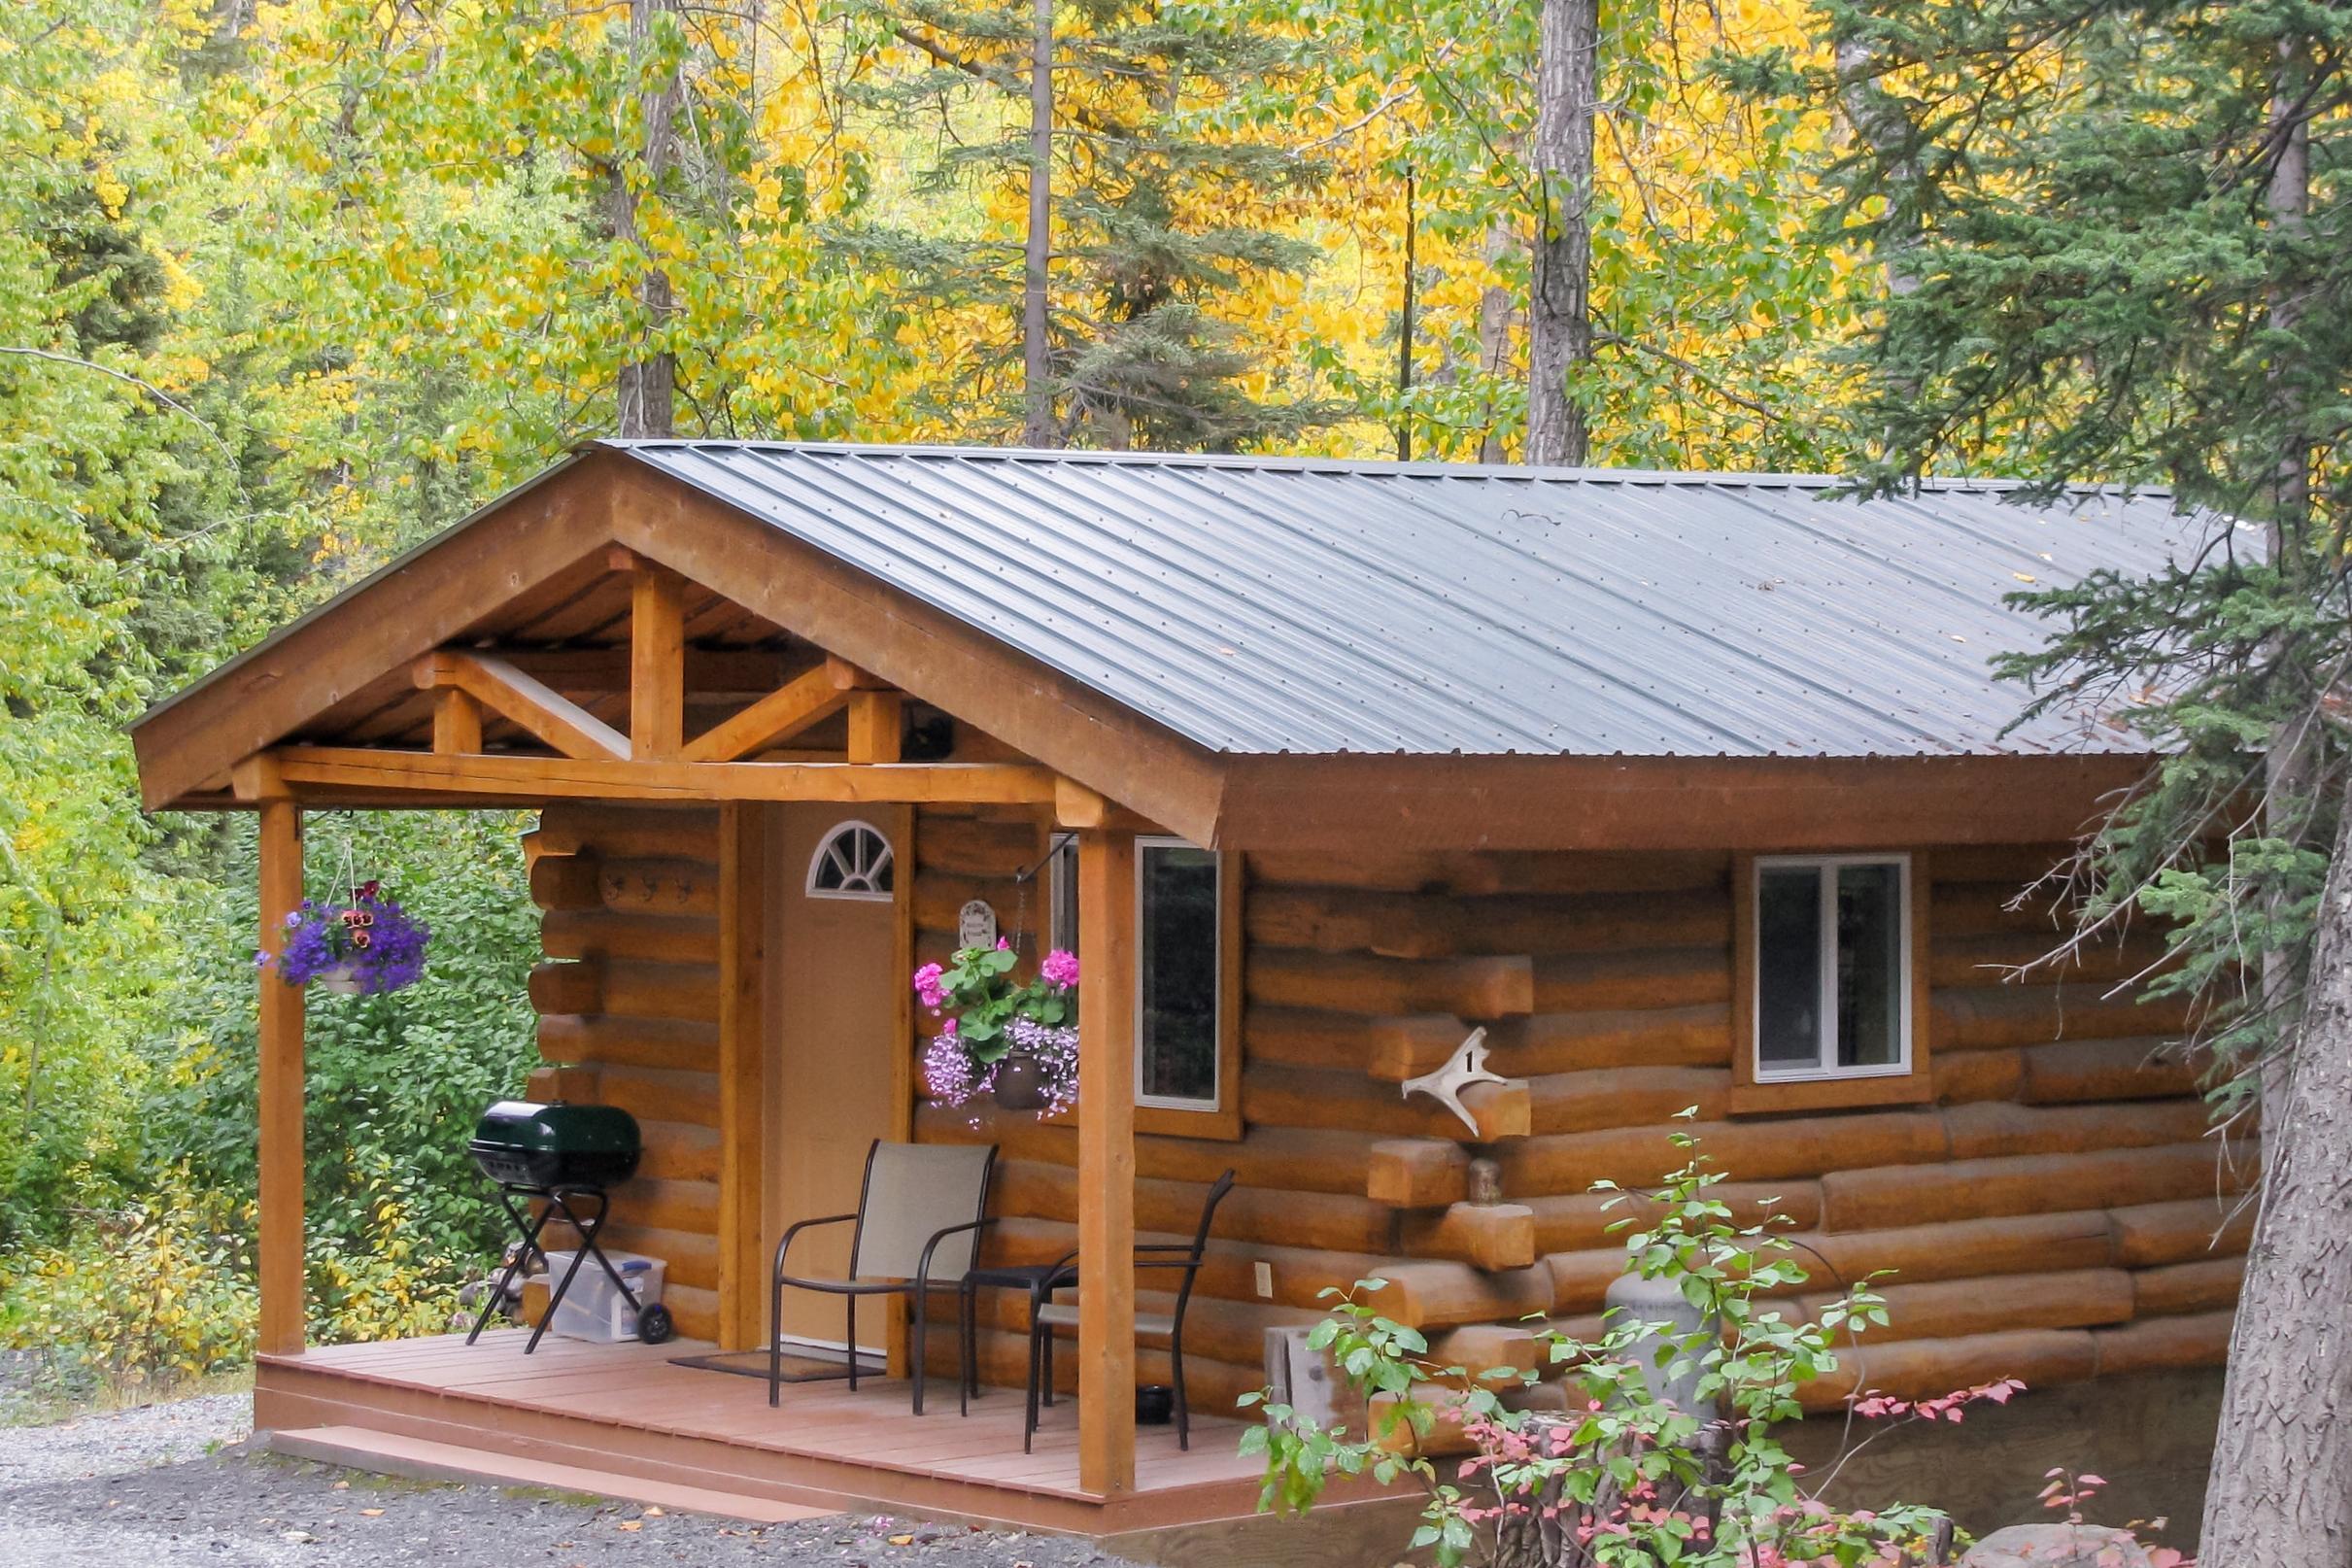 Homestead Guest Cabins cozy Spruce Ridge Cabin #1